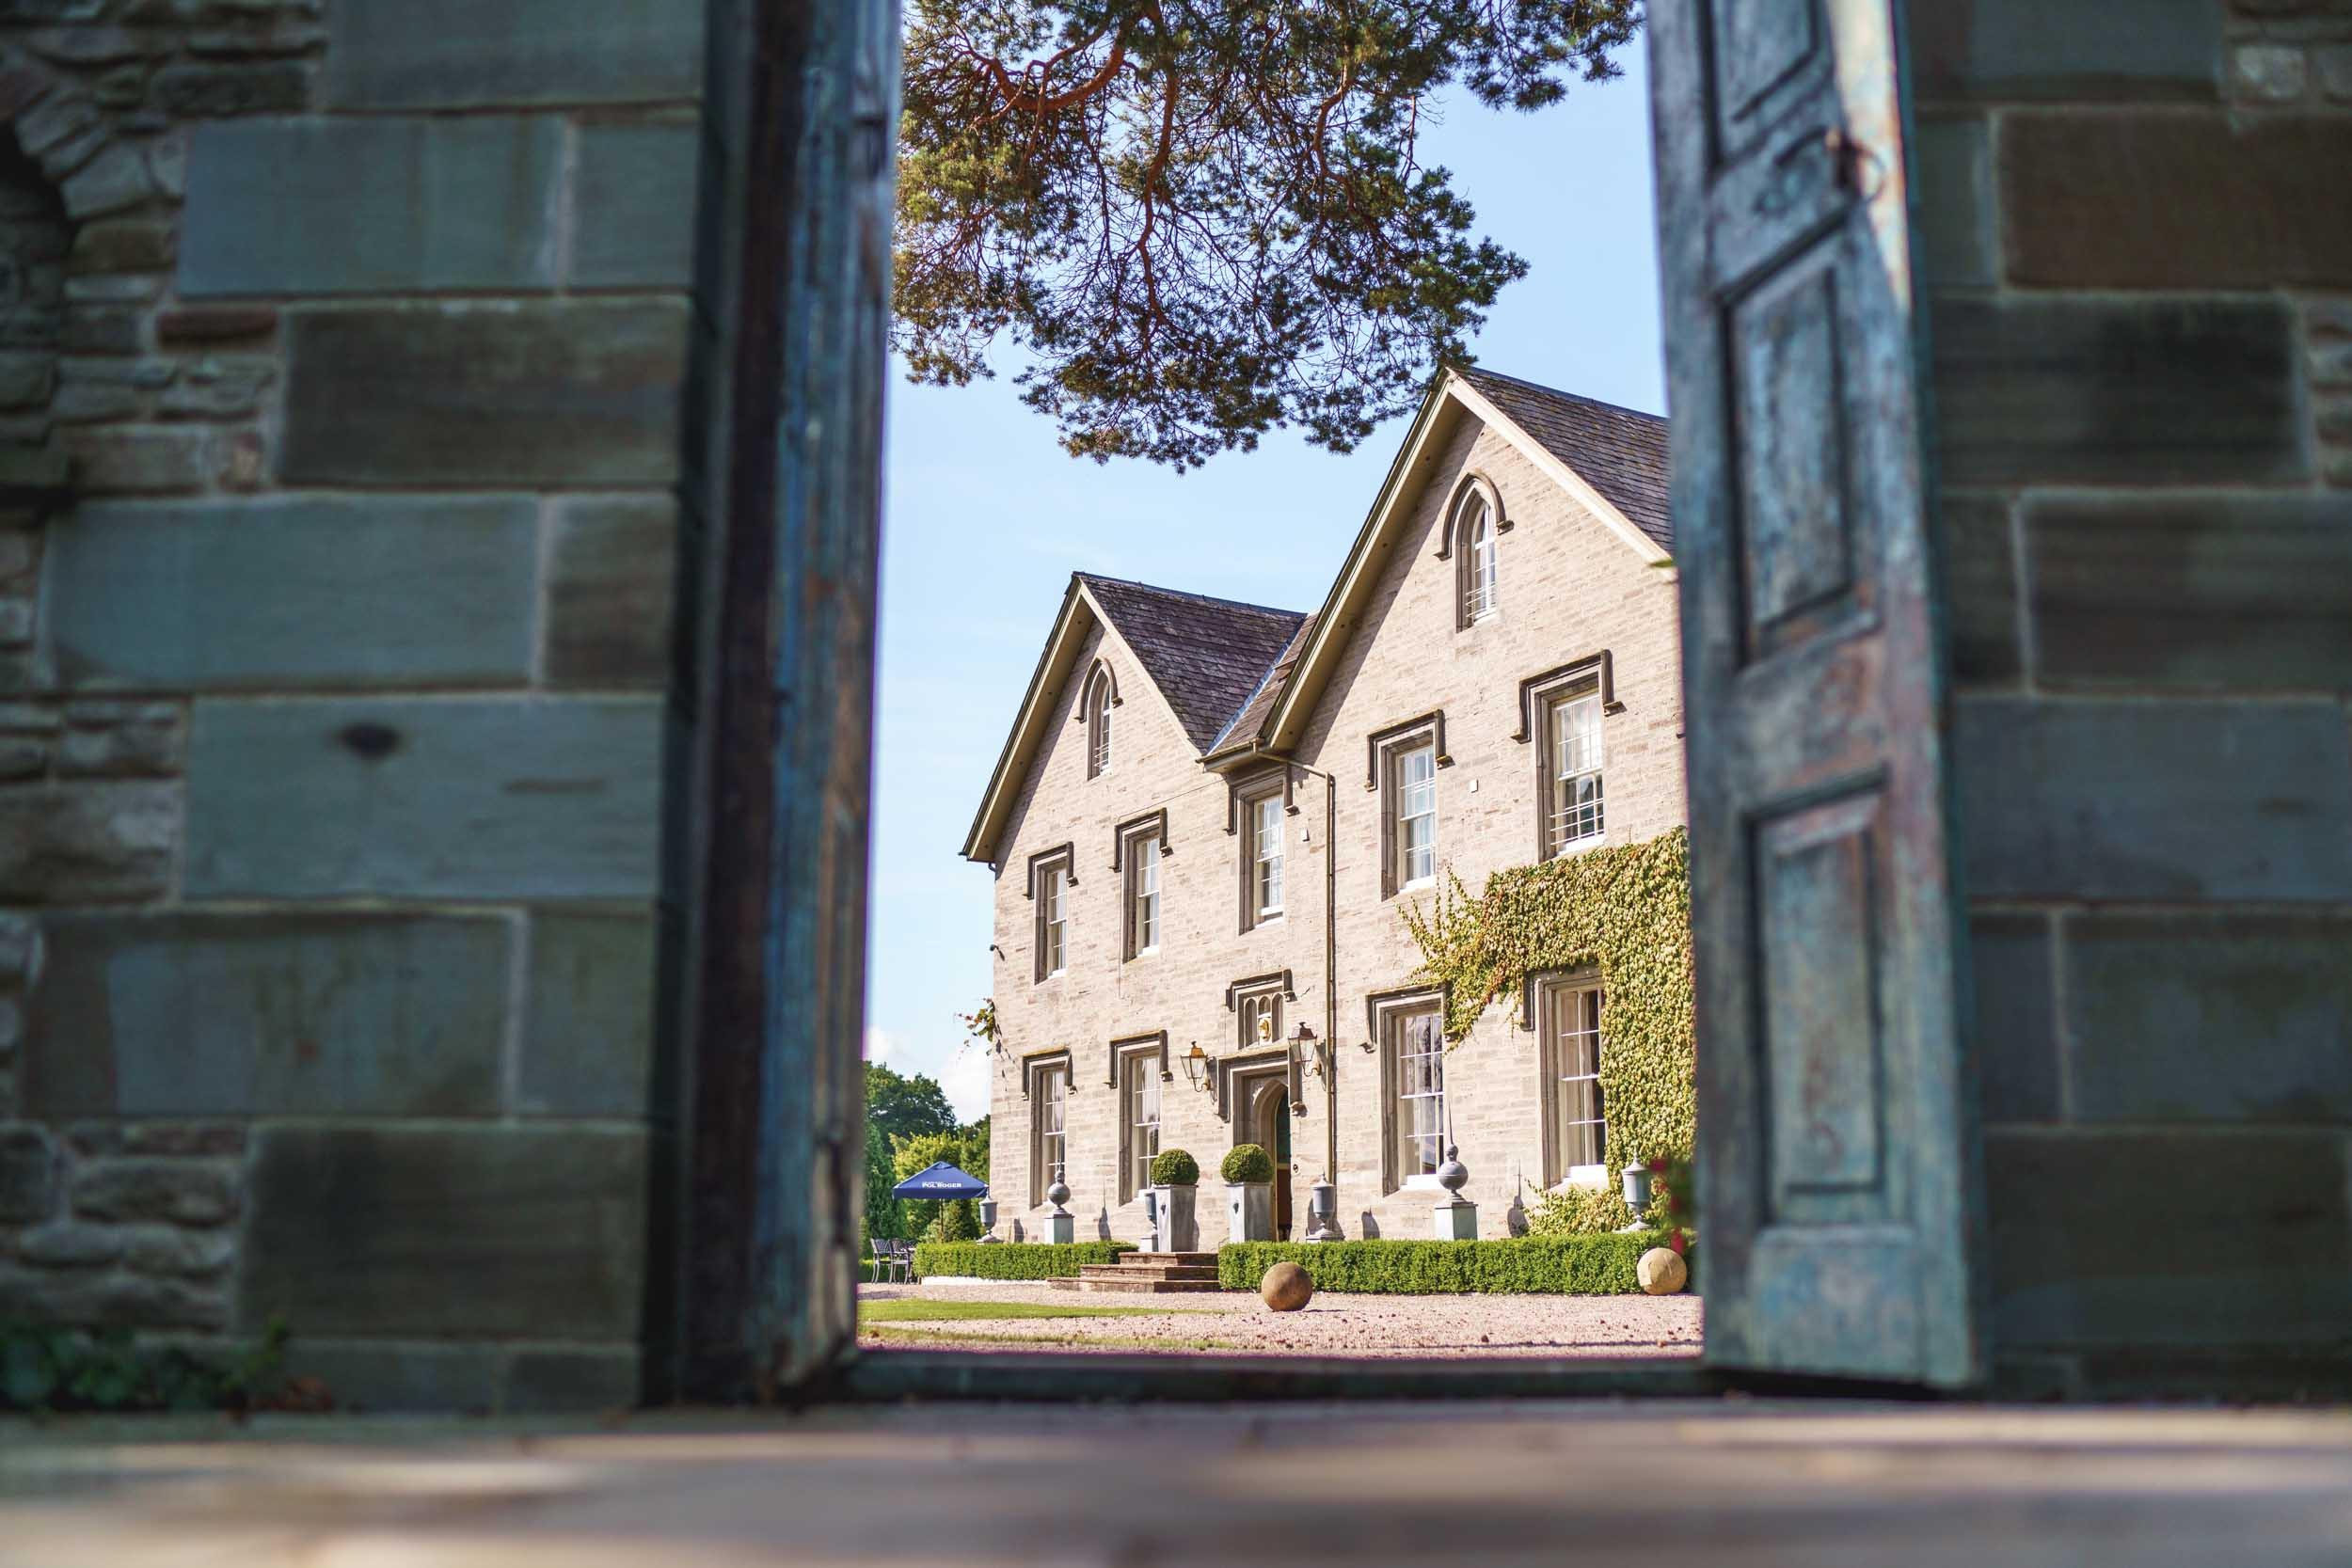 Lemore Manor Wedding Photographer, Wedding venue in Herefordshire, Lemore Manor Weddings, Lemore, Manor, Wedding, photography